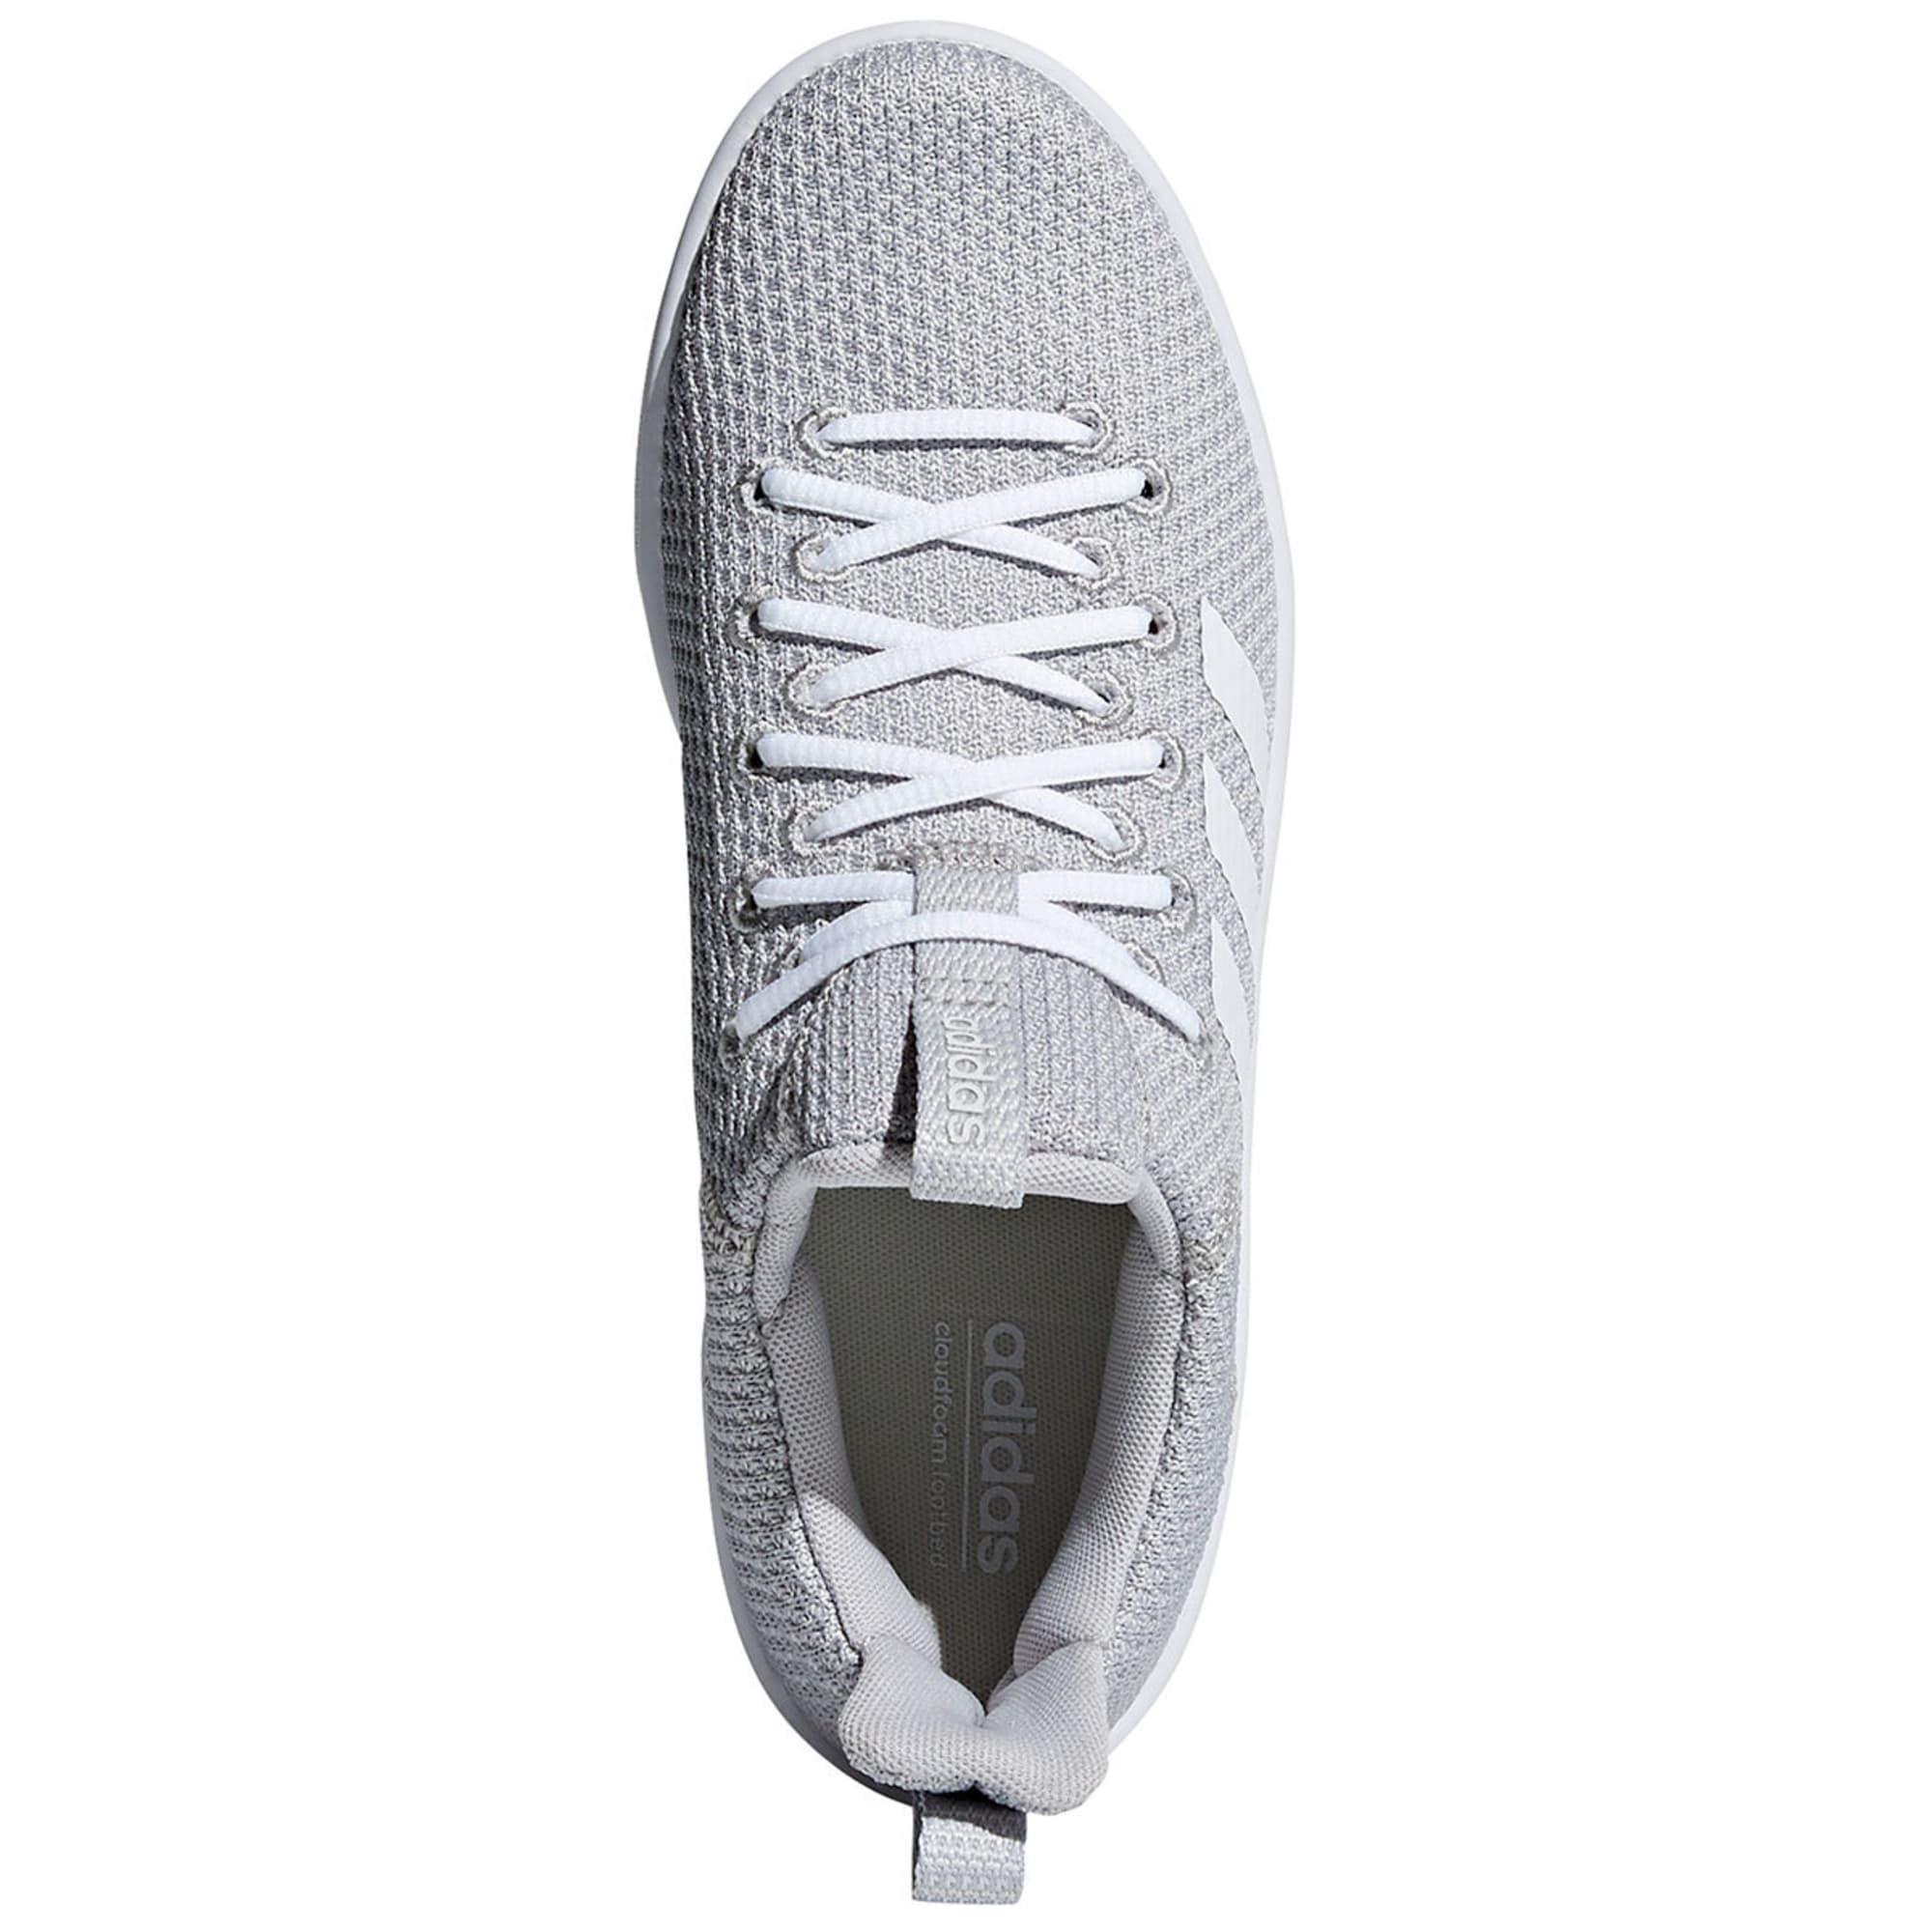 ADIDAS Women's Cloudfoam Advantage Adapt Sneakers